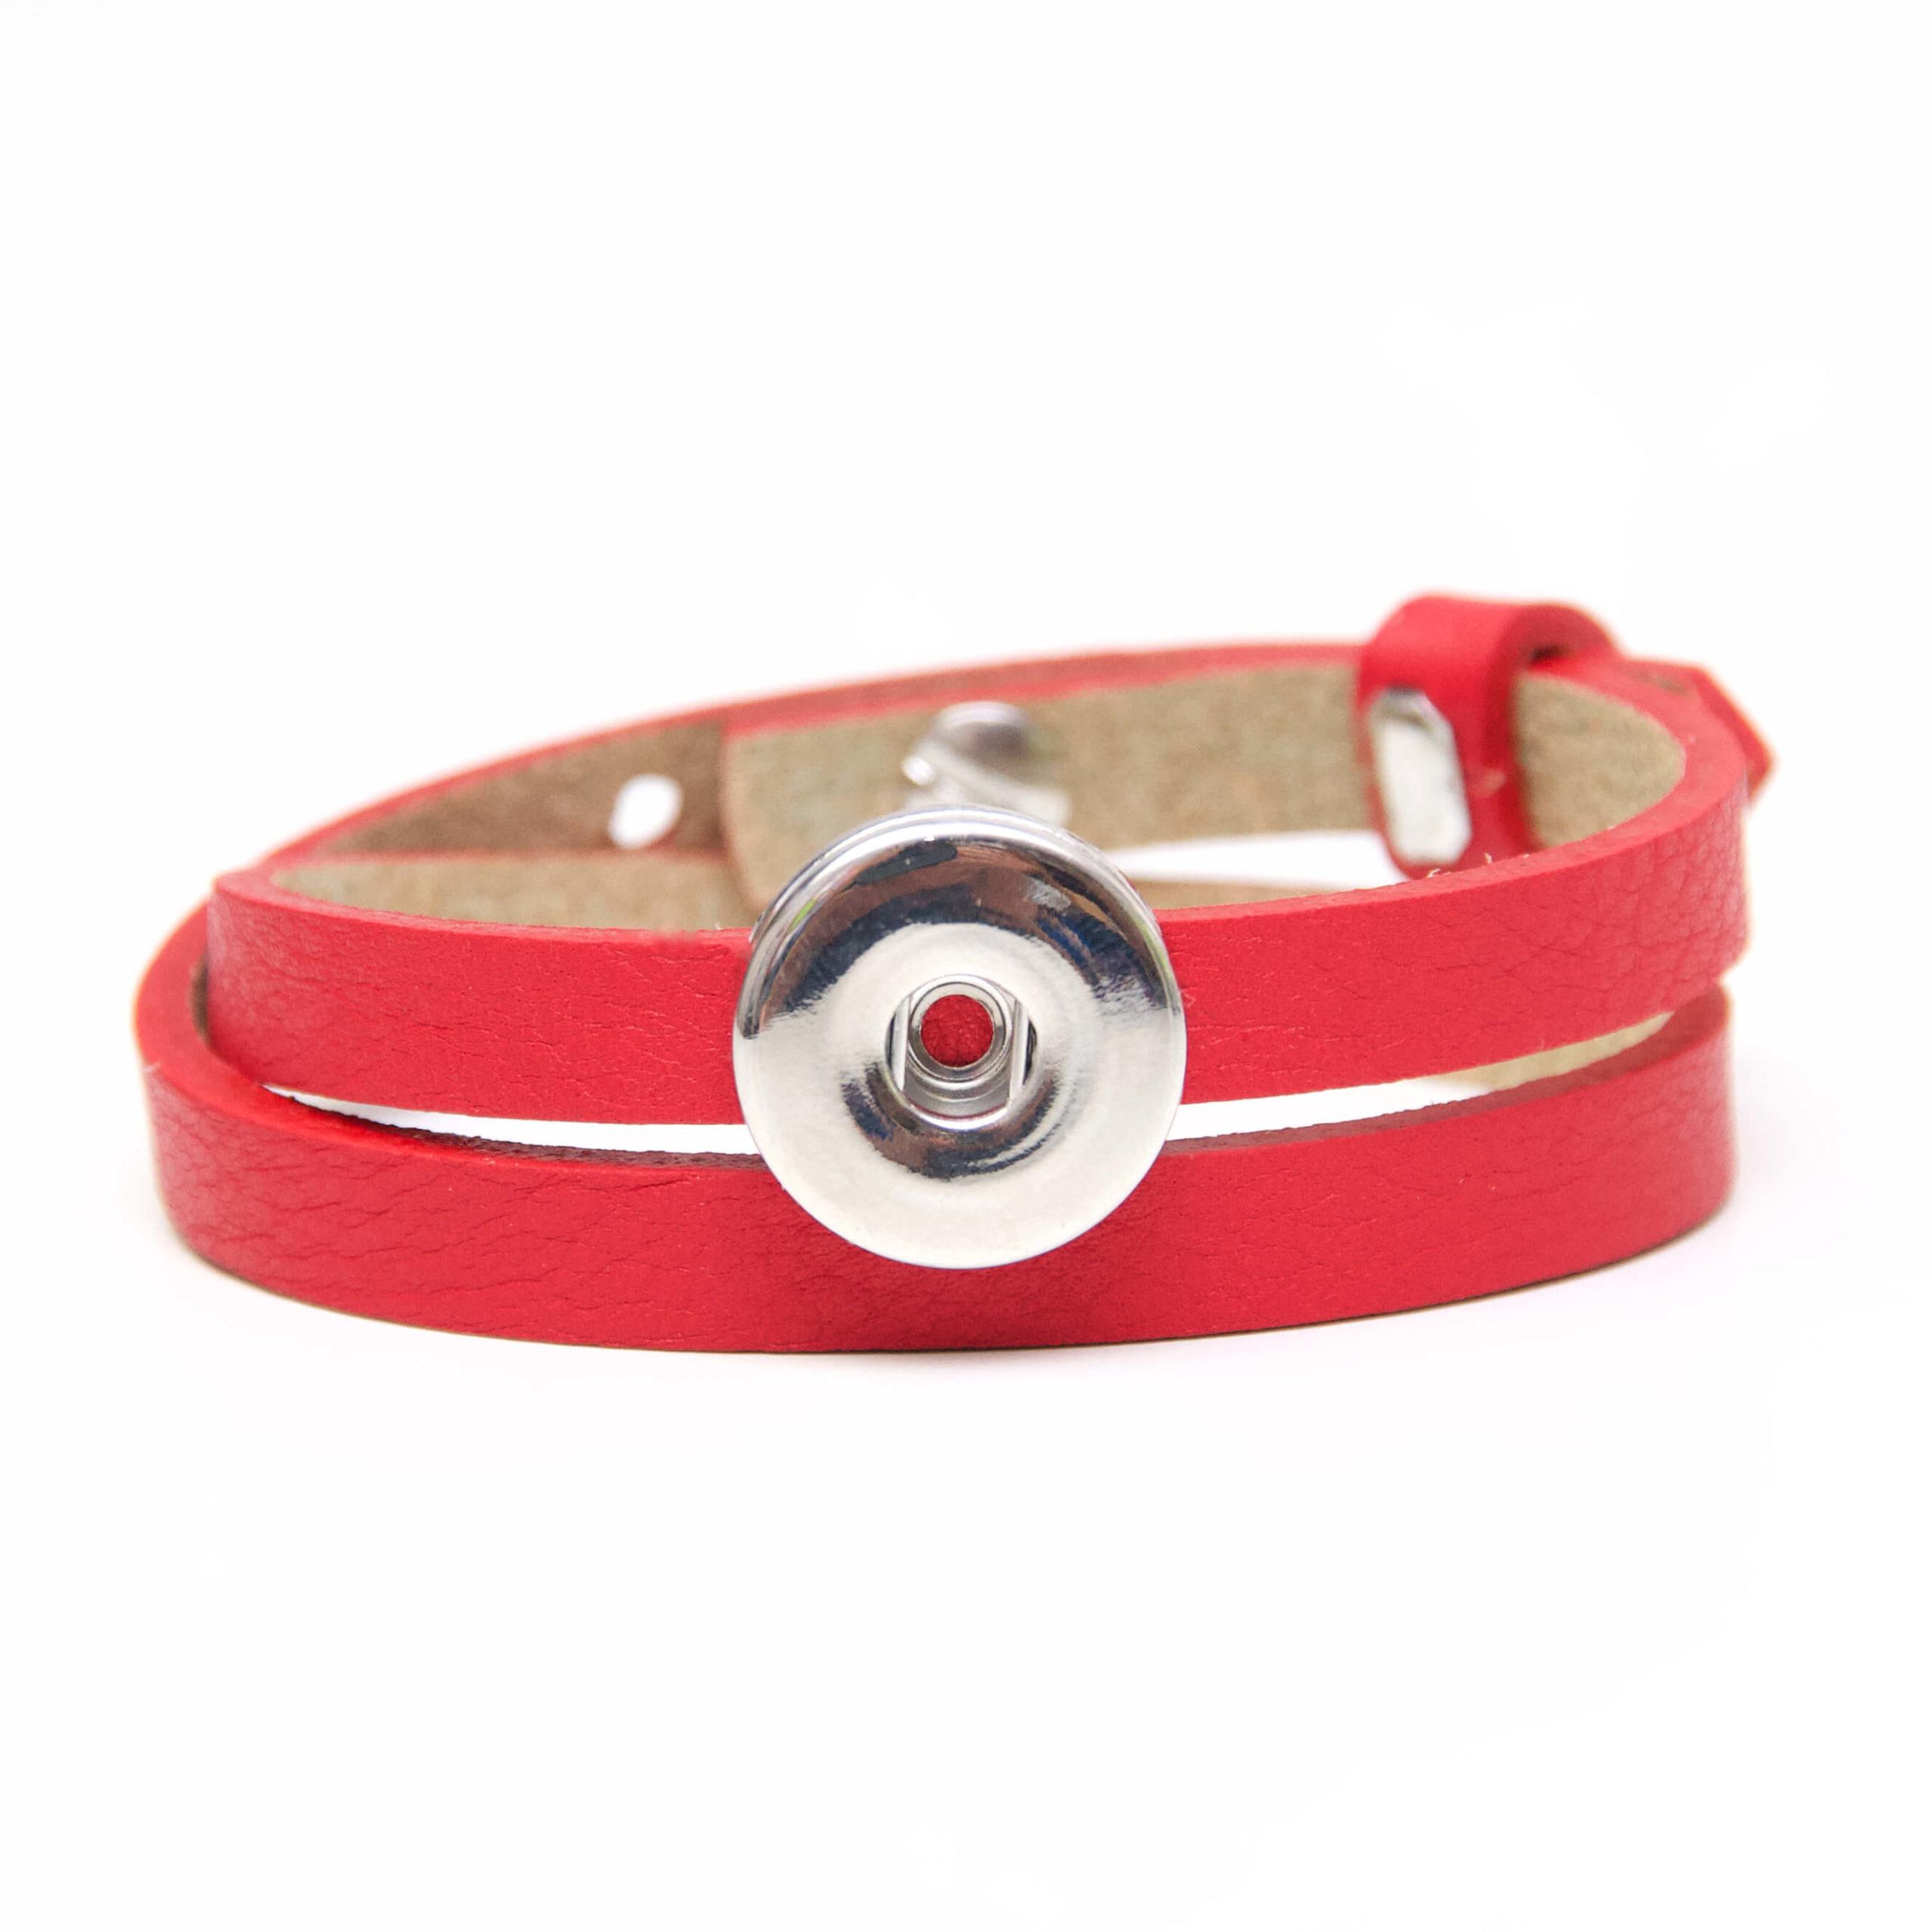 Druckknopf Lederarmband in rot für 16mm Druckknöpfe